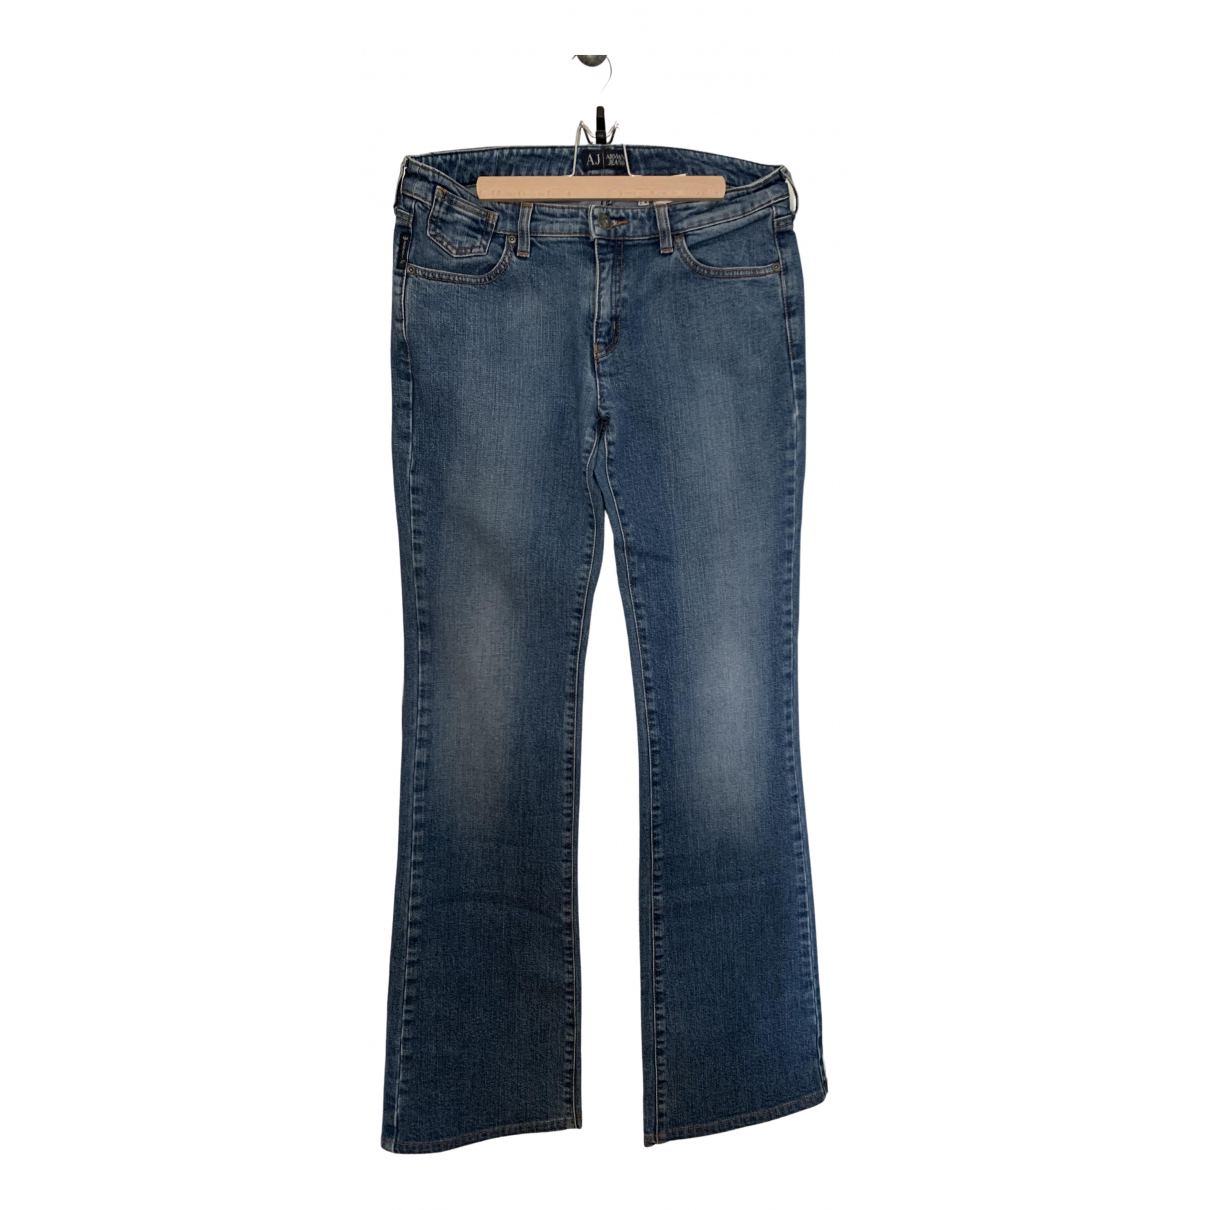 Armani Jeans \N Blue Denim - Jeans Jeans for Women 38 FR